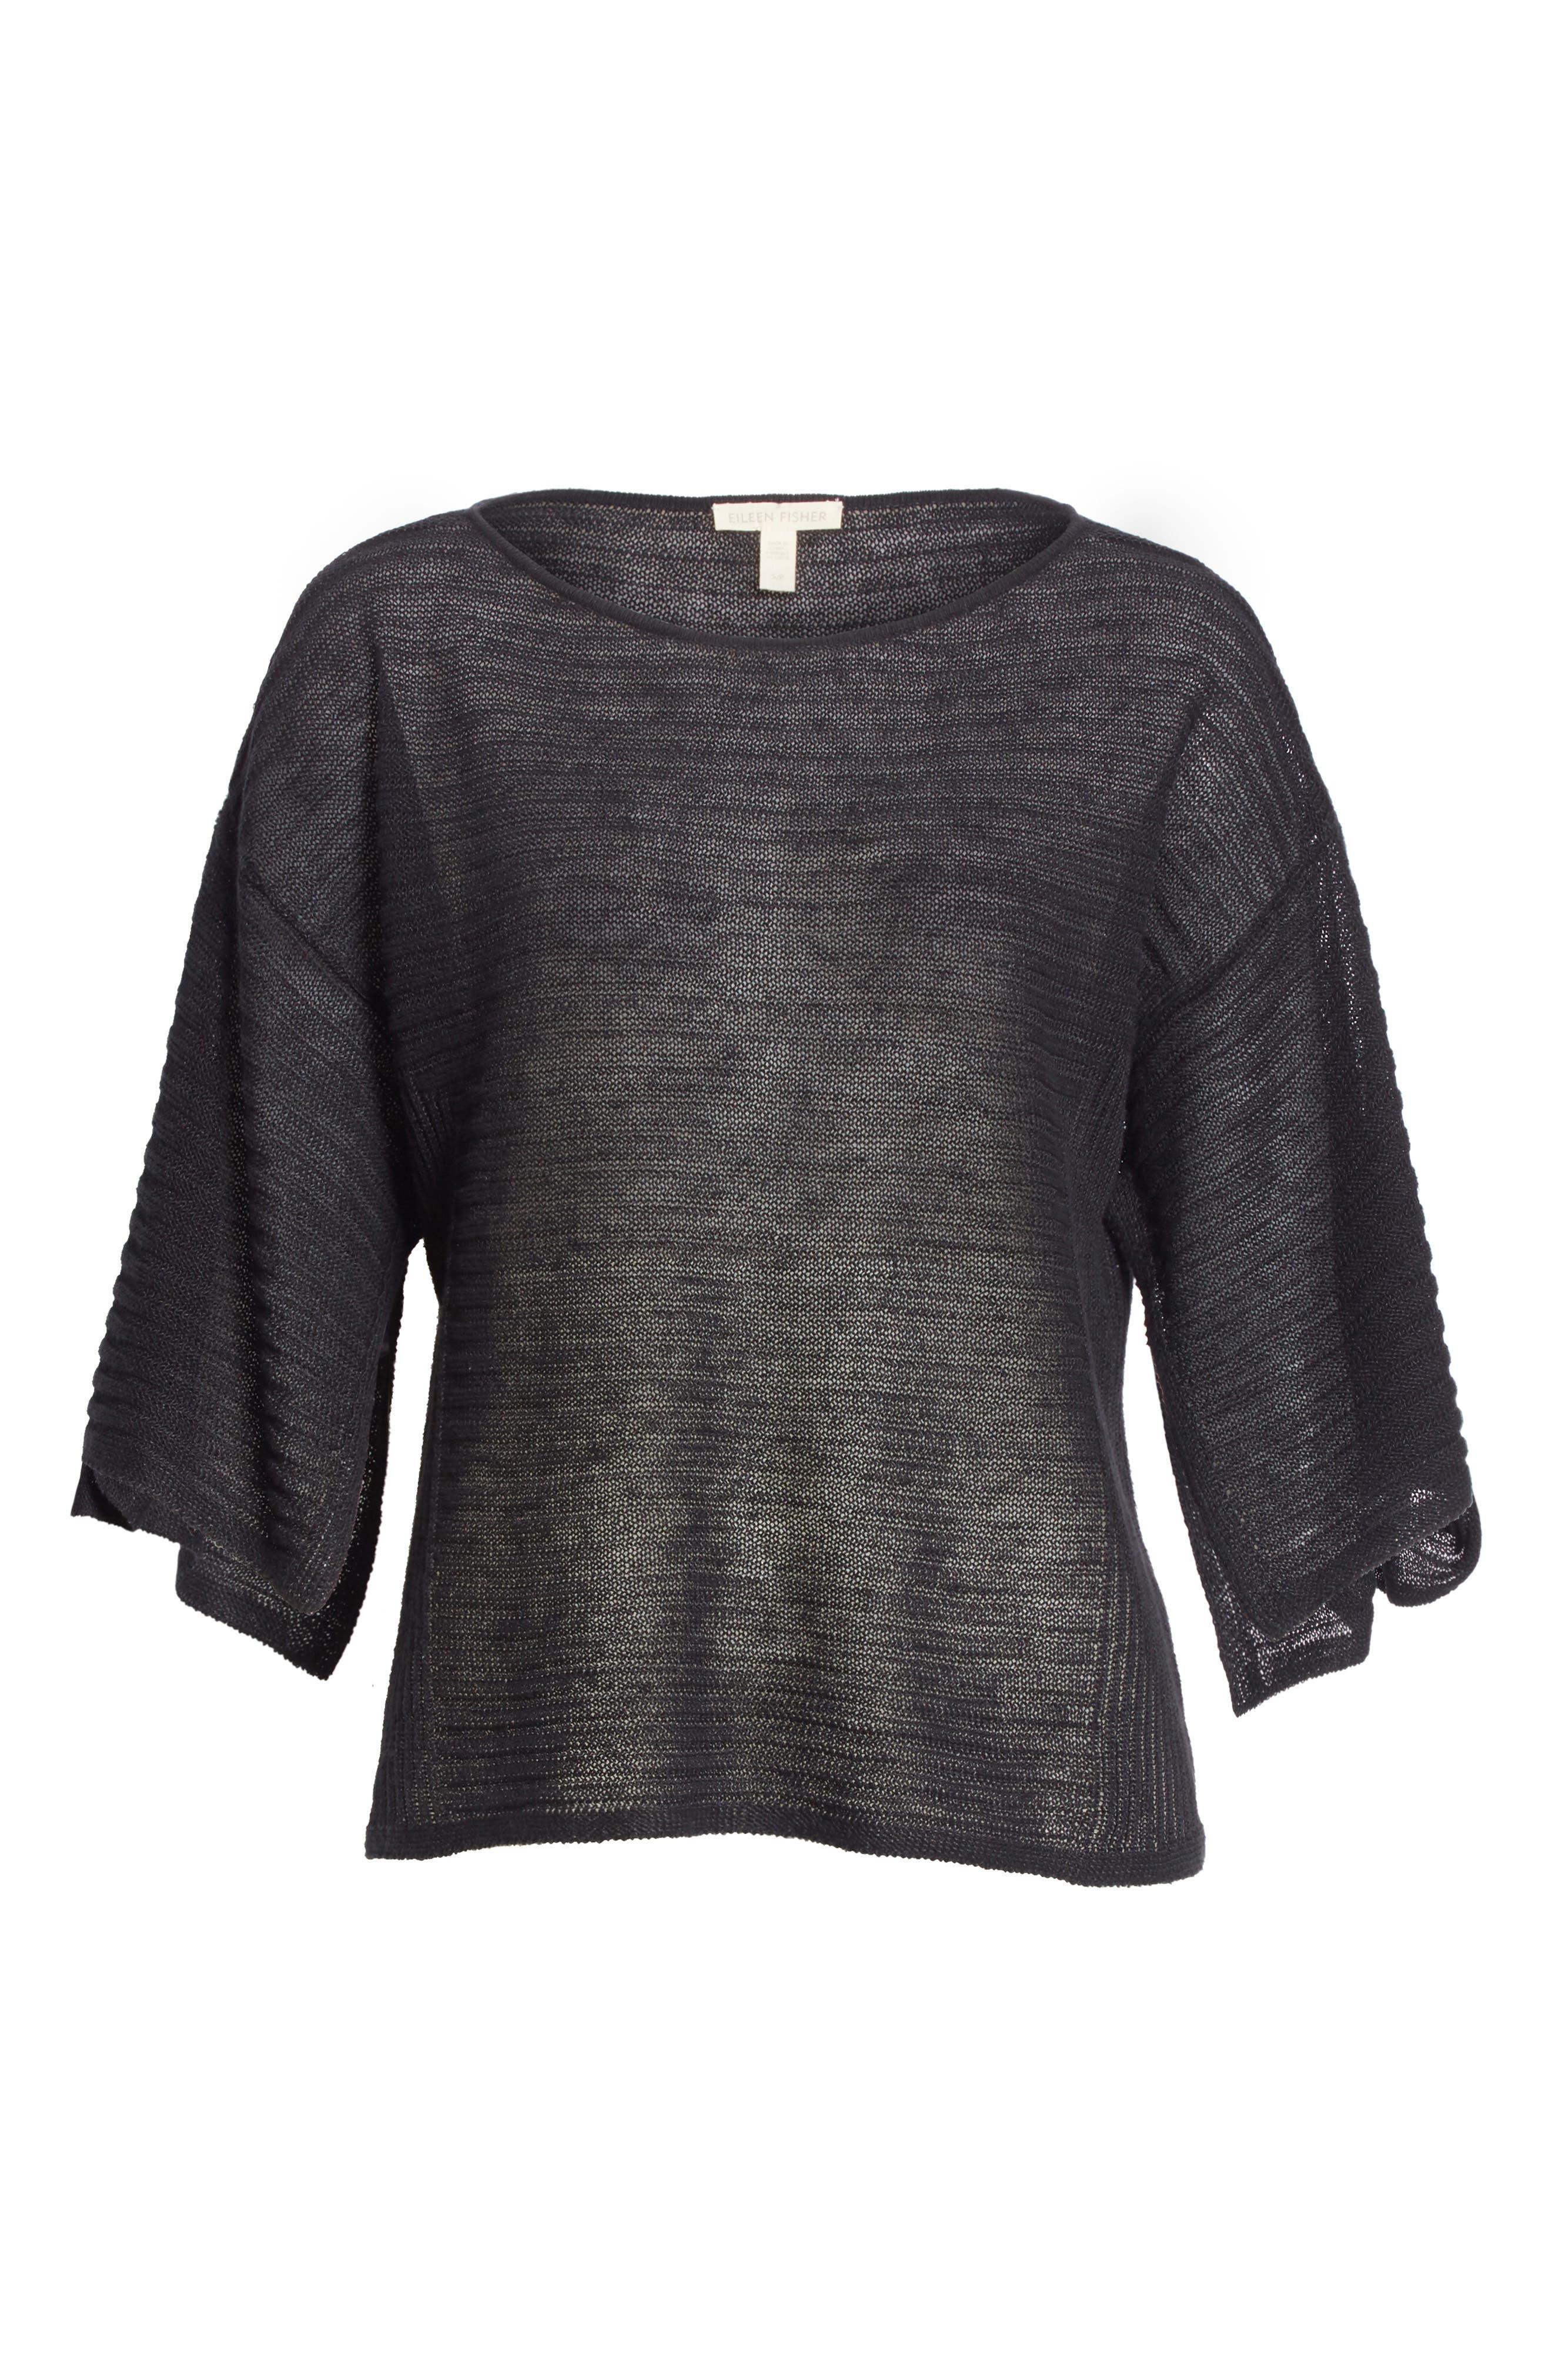 Slit Sleeve Organic Linen Sweater,                             Alternate thumbnail 6, color,                             001